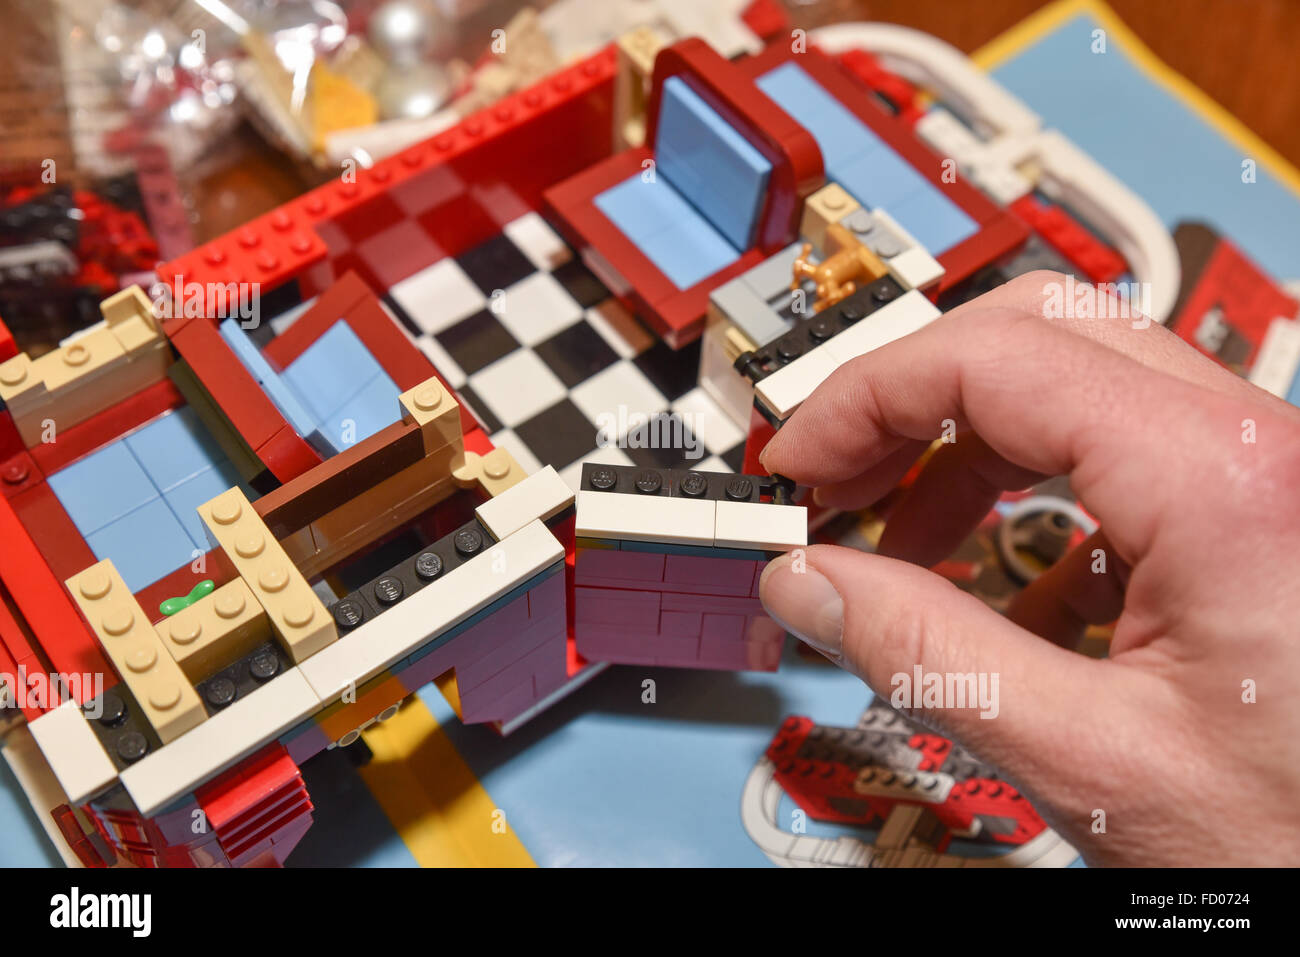 camper lego ac lightailing creator model dp com amazon building van blocks volkswagen series light set for